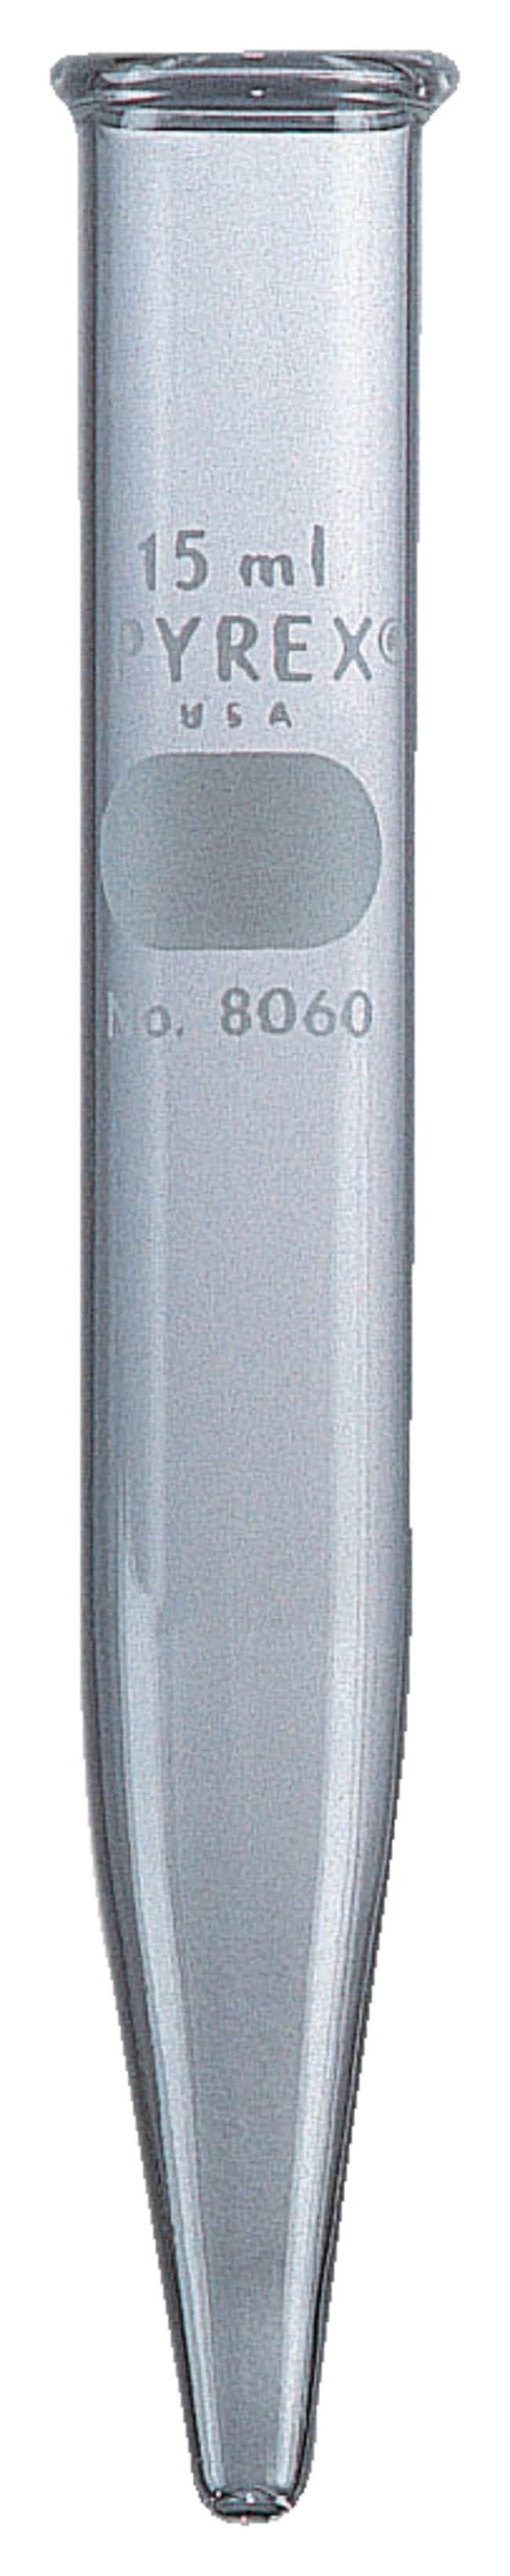 PYREX Centrifuge Tubes :Test Tubes, Vials, Caps and Closures:Tubes